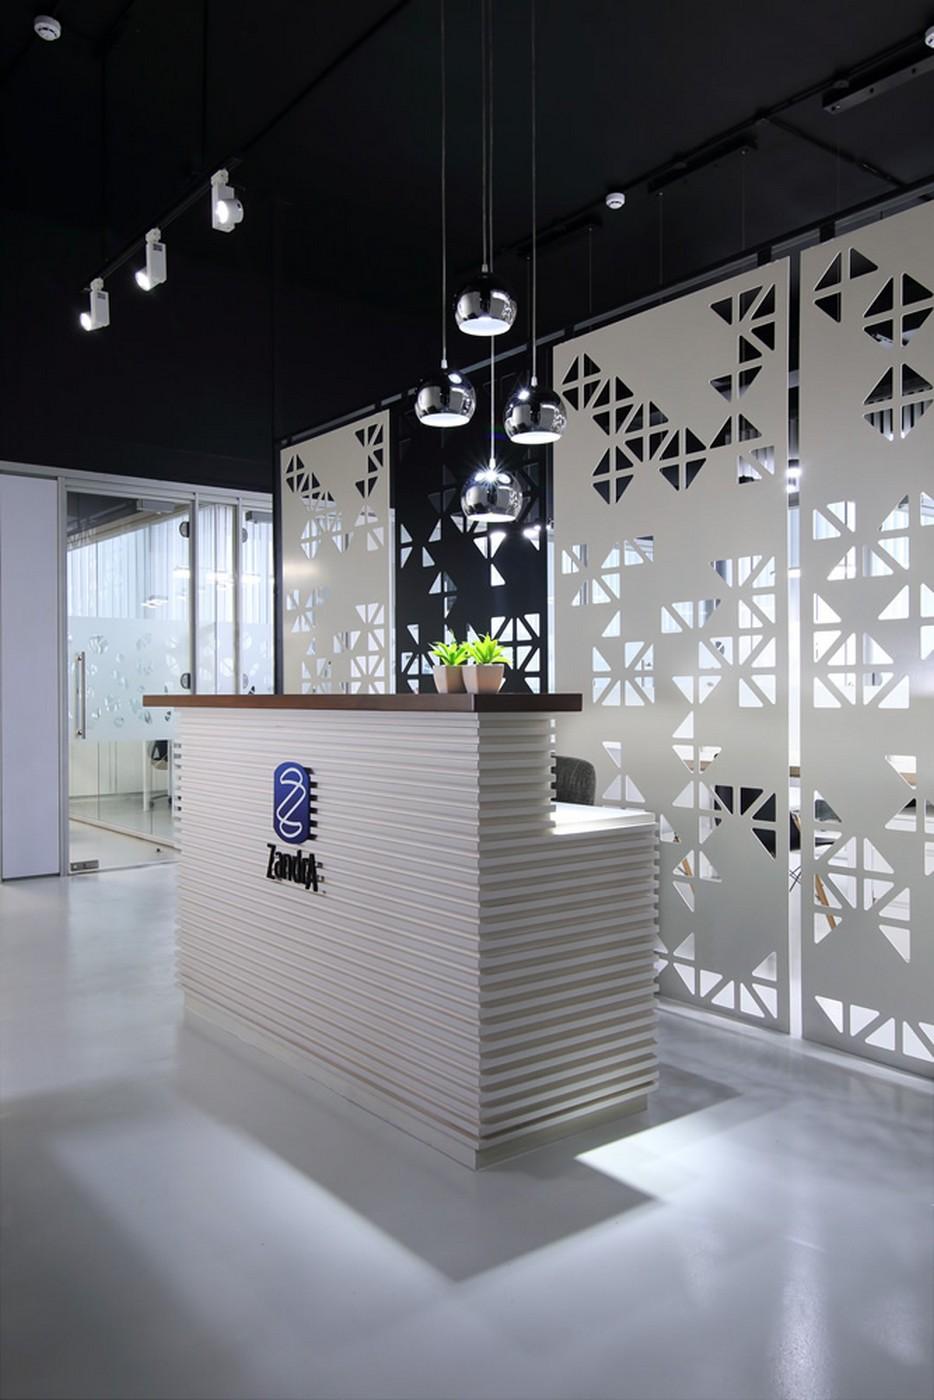 Surprising Concept of Office Idea